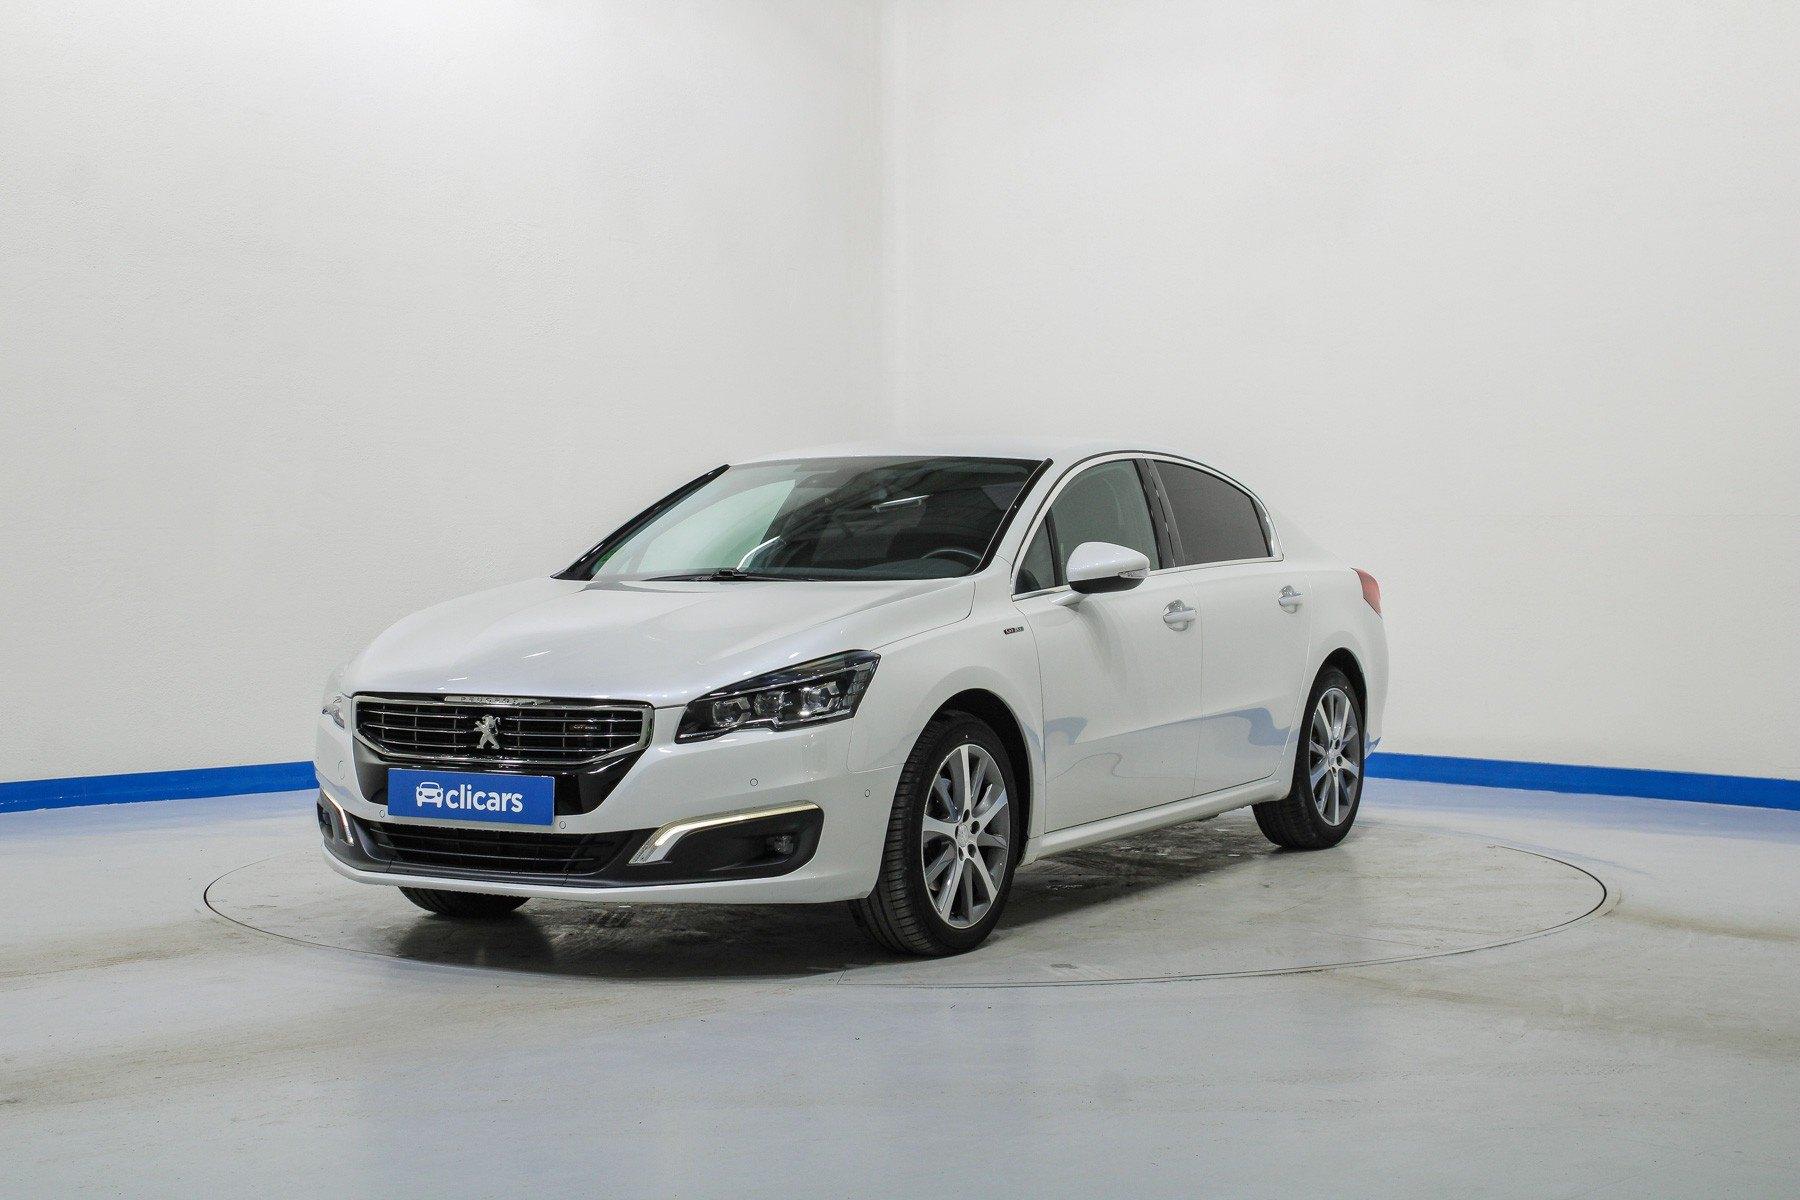 Peugeot 508 Diésel GT Line 2.0 BlueHDi 110KW (150CV) 1